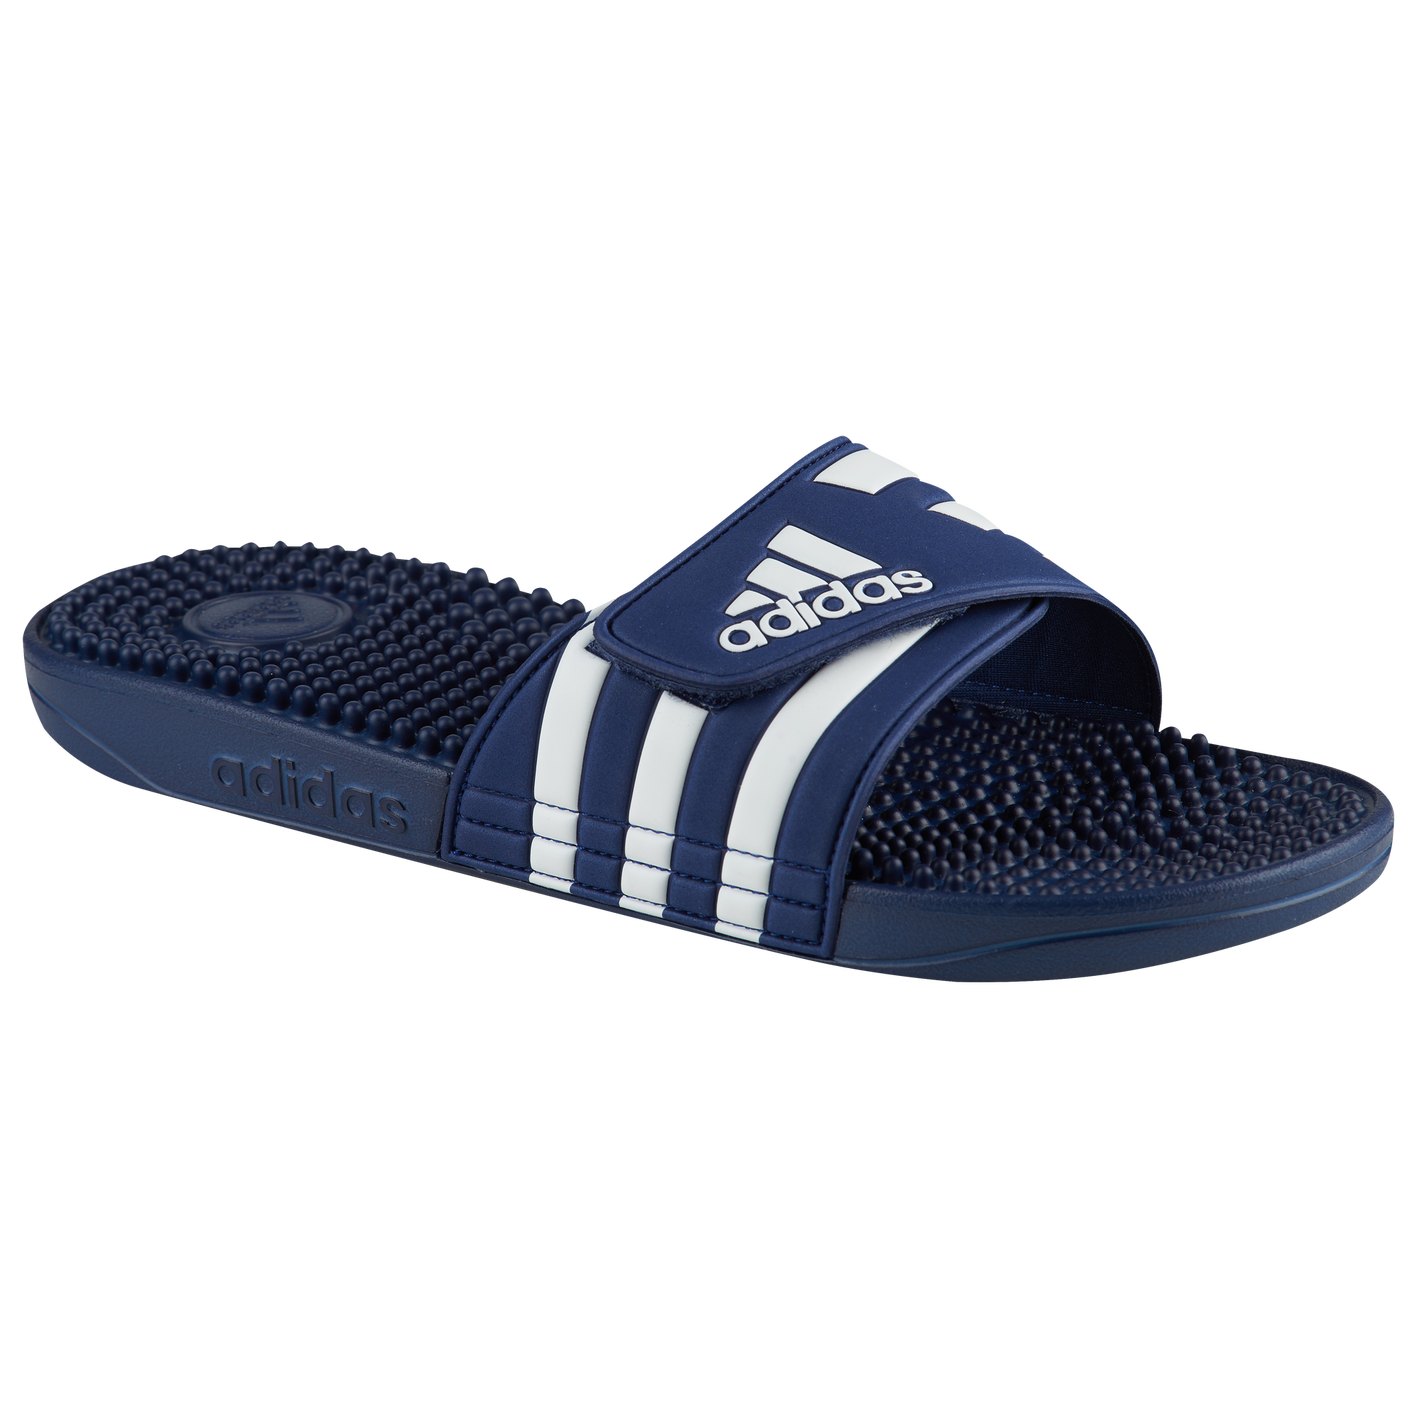 on sale d0ebe c3dd7 adidas Adissage Slide - Men s